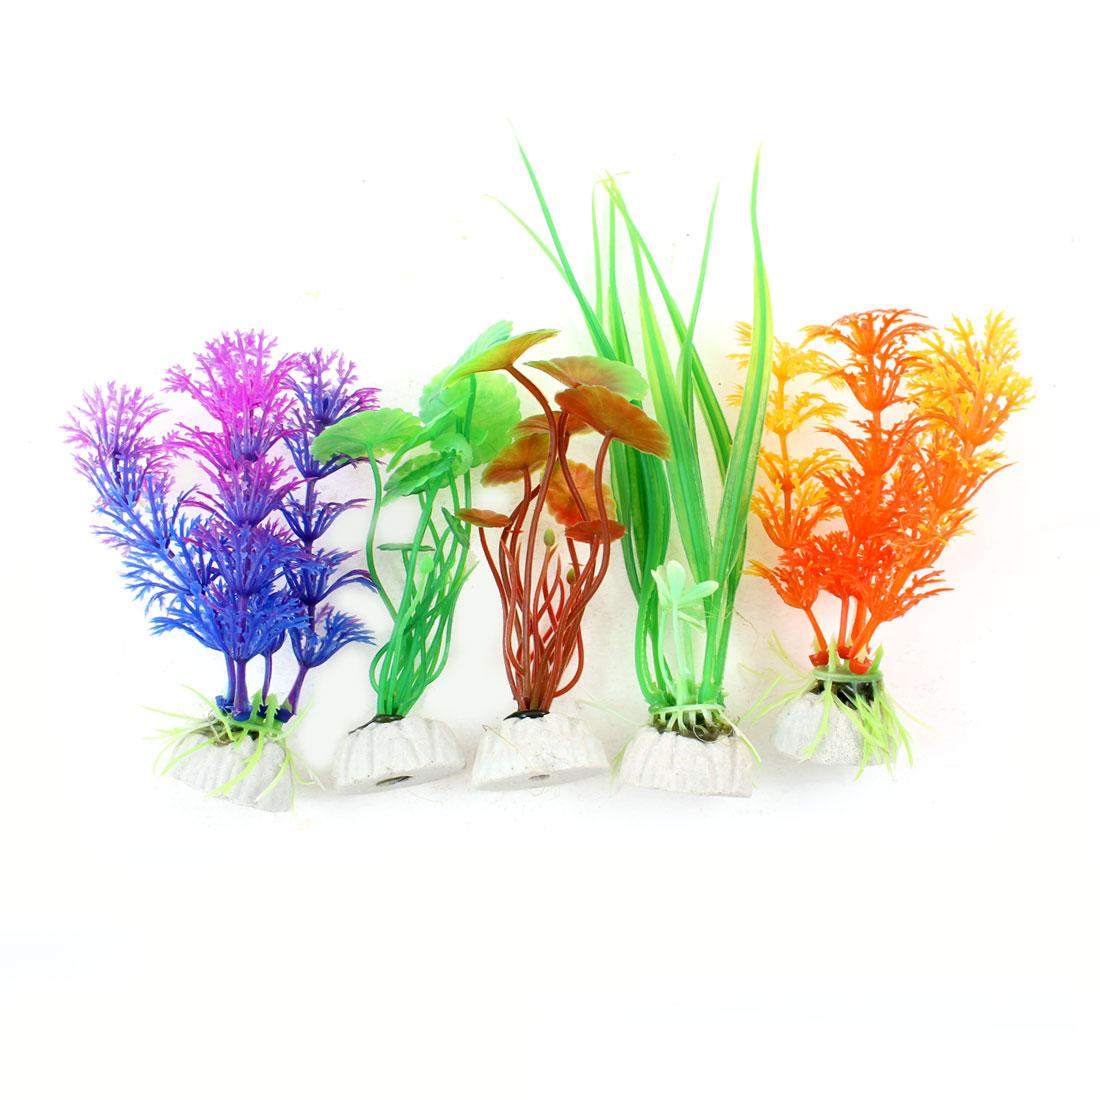 "5 Pcs 6.3"" High Simulation Aquatic Water Grasses Assorted Color for Fish Tank"